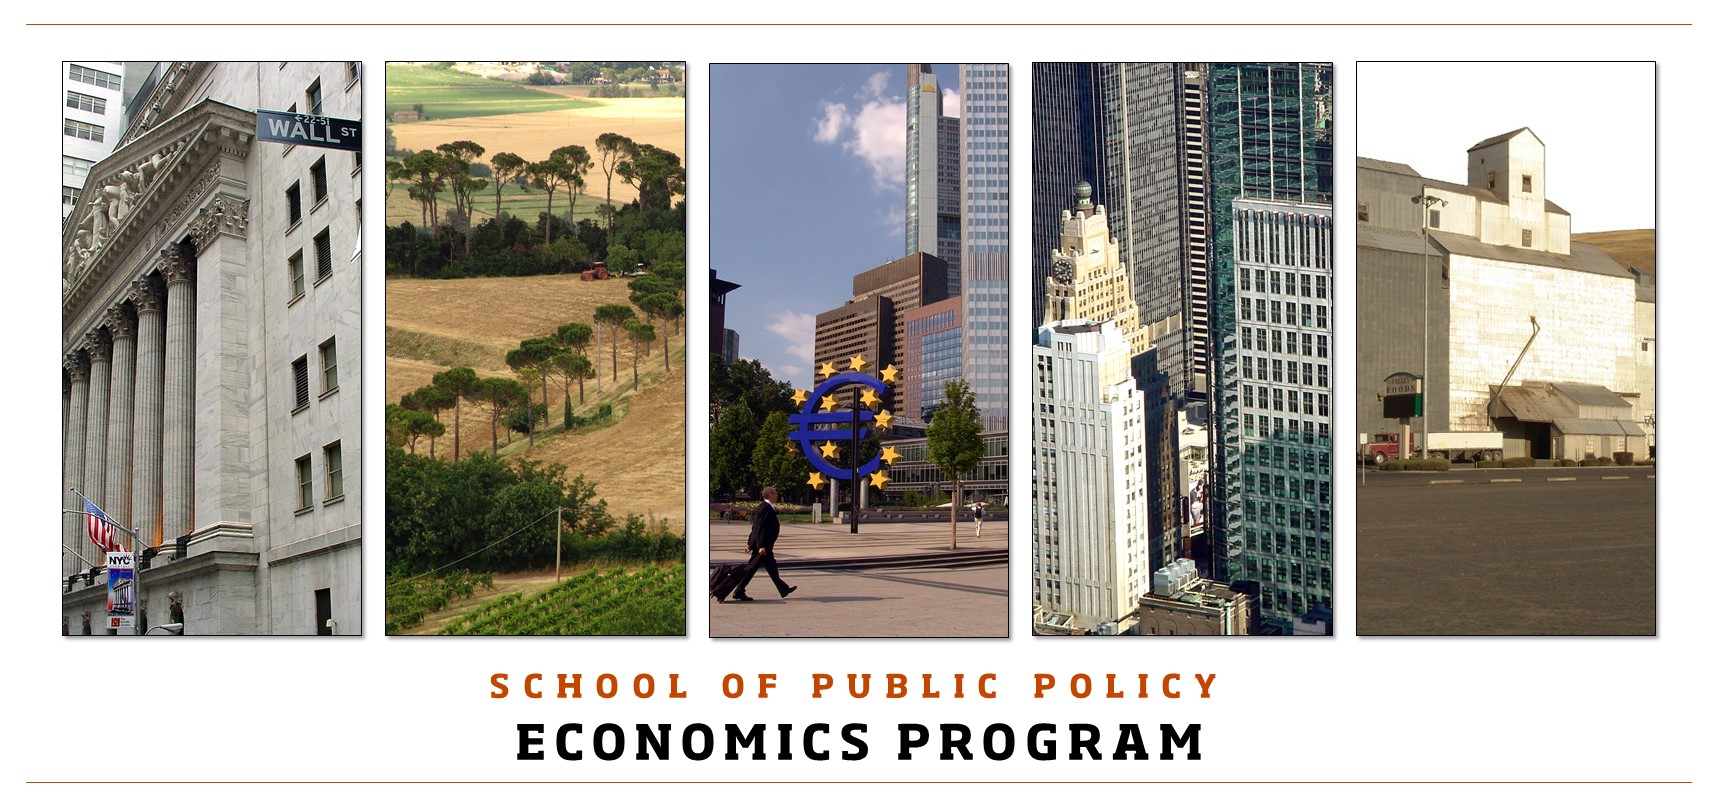 School of Public Policy Economics Program